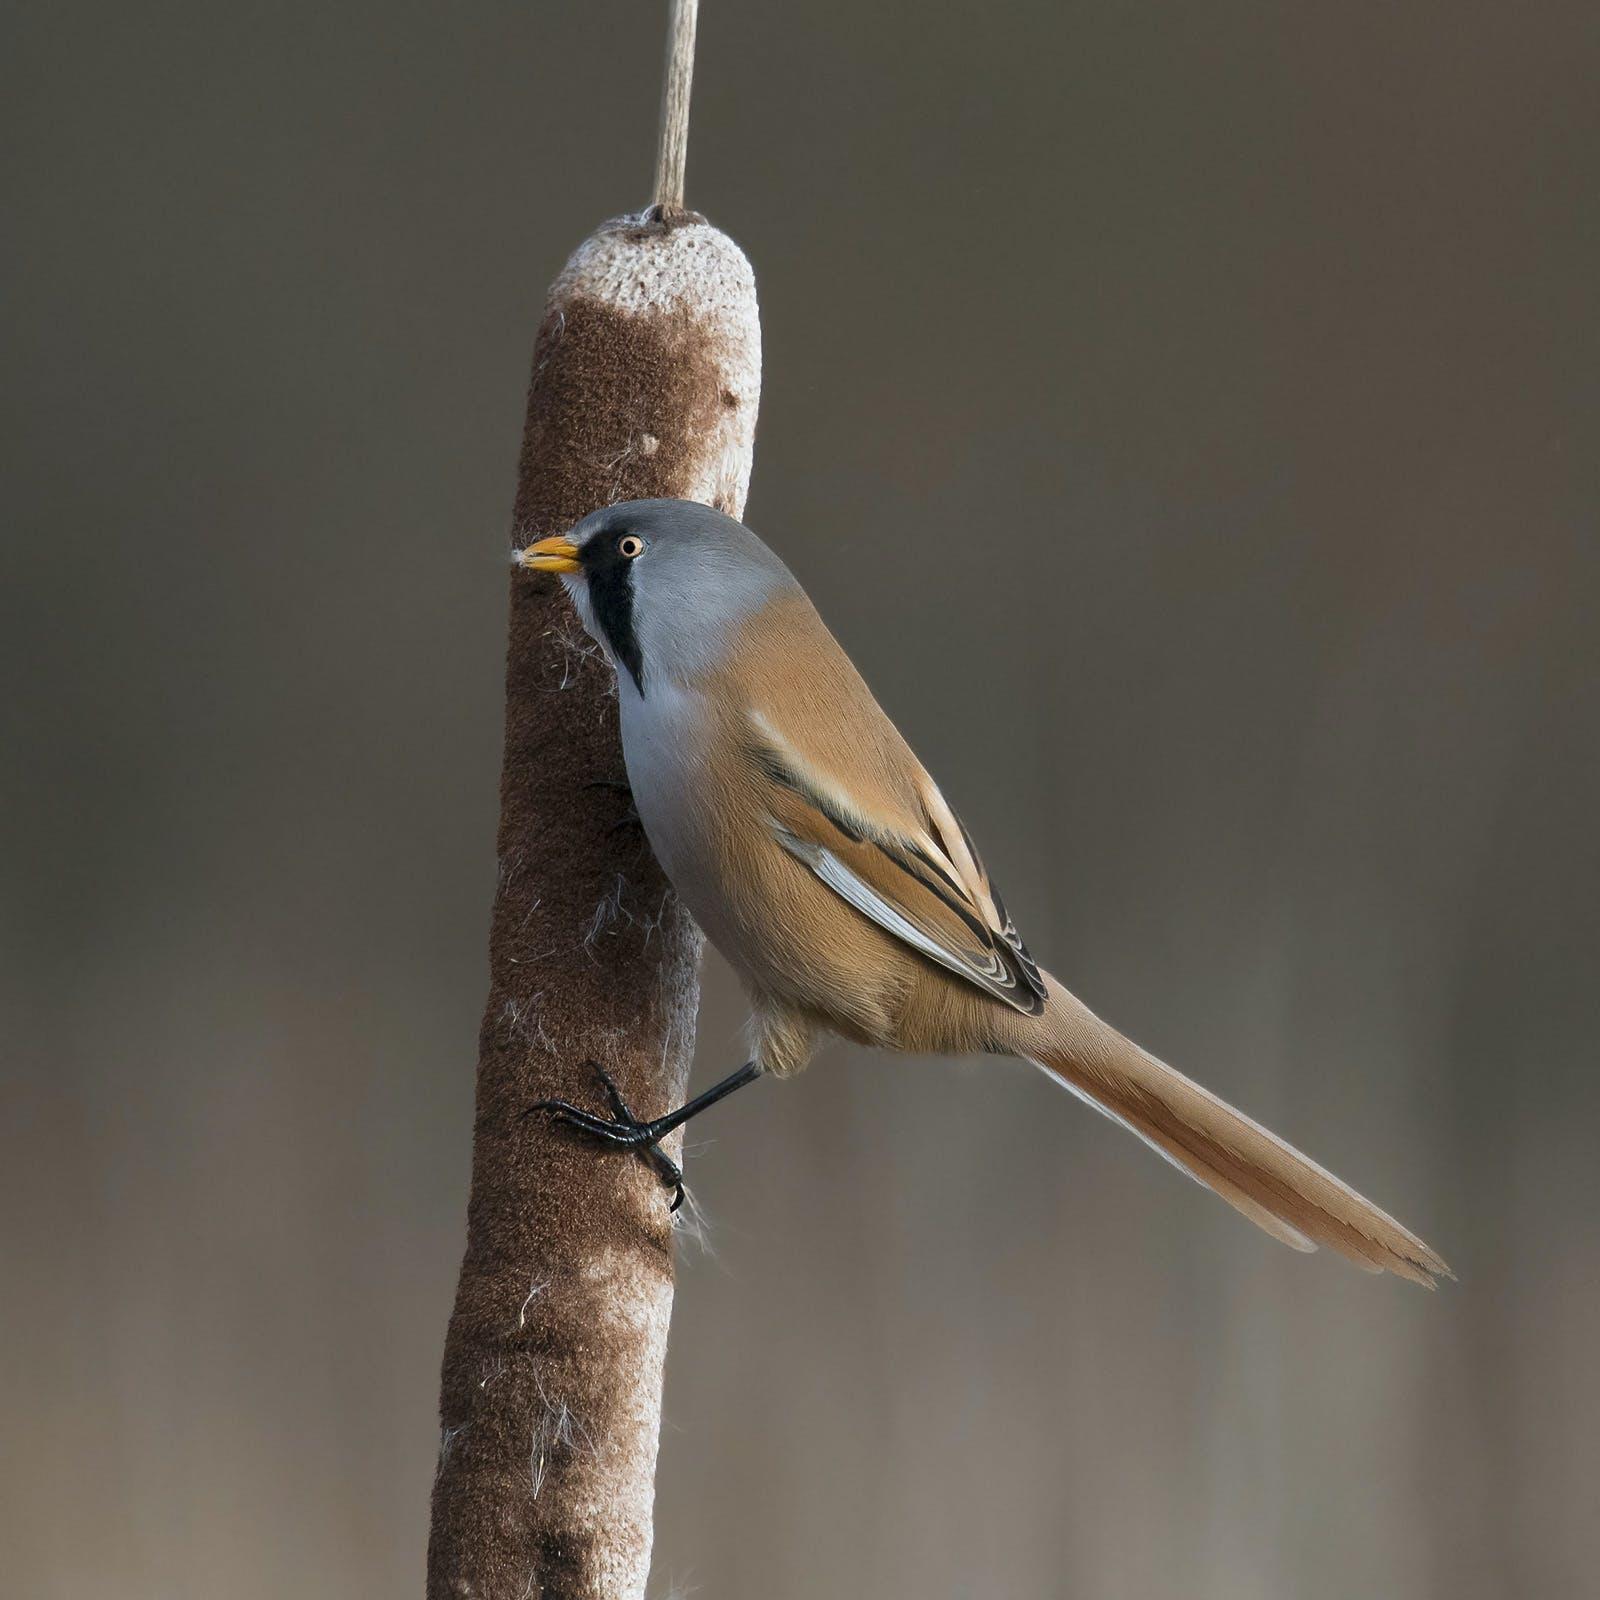 Free stock photo of Bearded Reedling, Reedmace, small bird